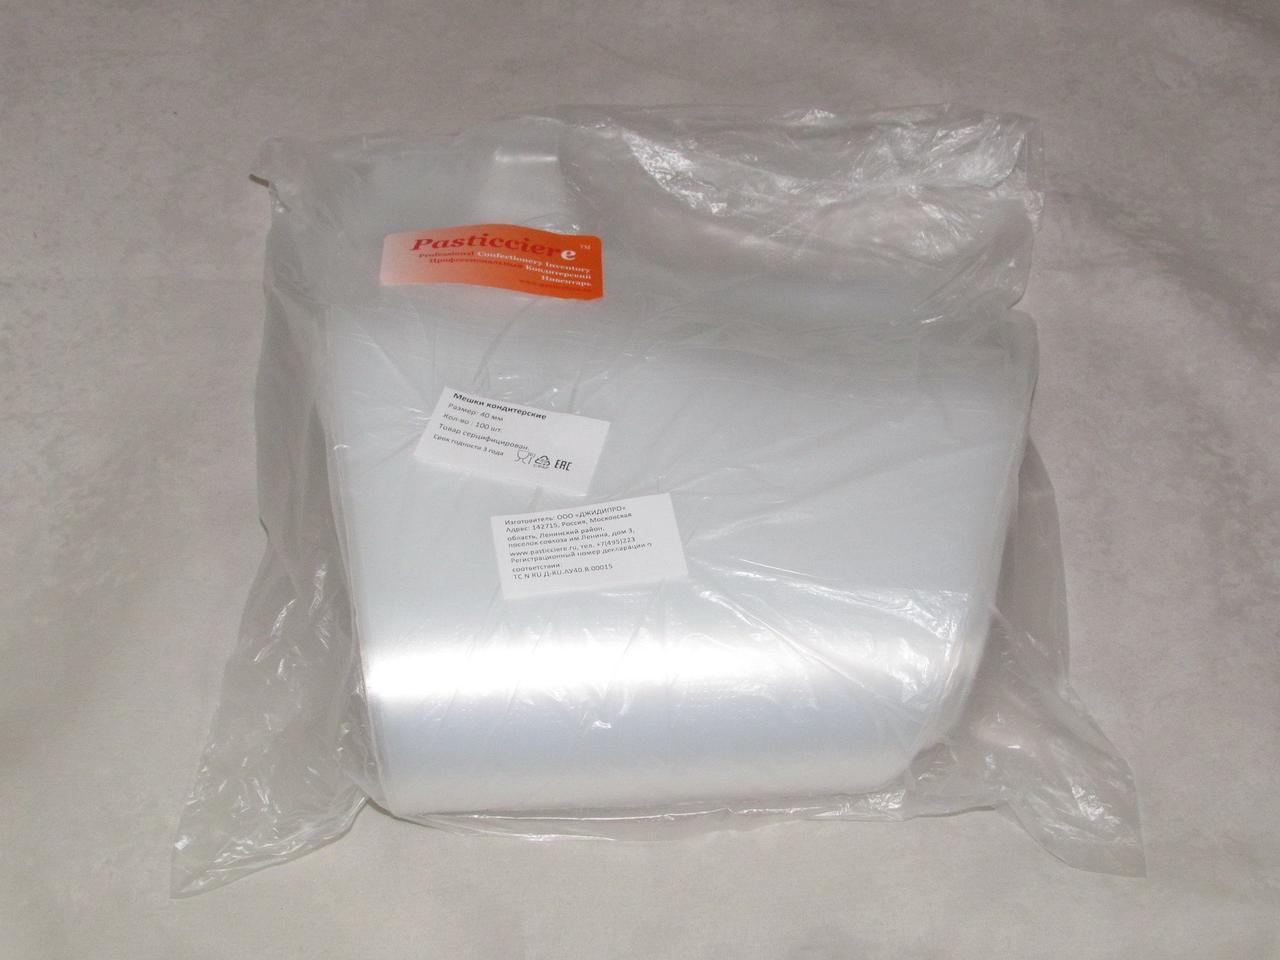 Мешок кондитерский в пачке PASTICCIERE, прозр,  40 см, 100 шт